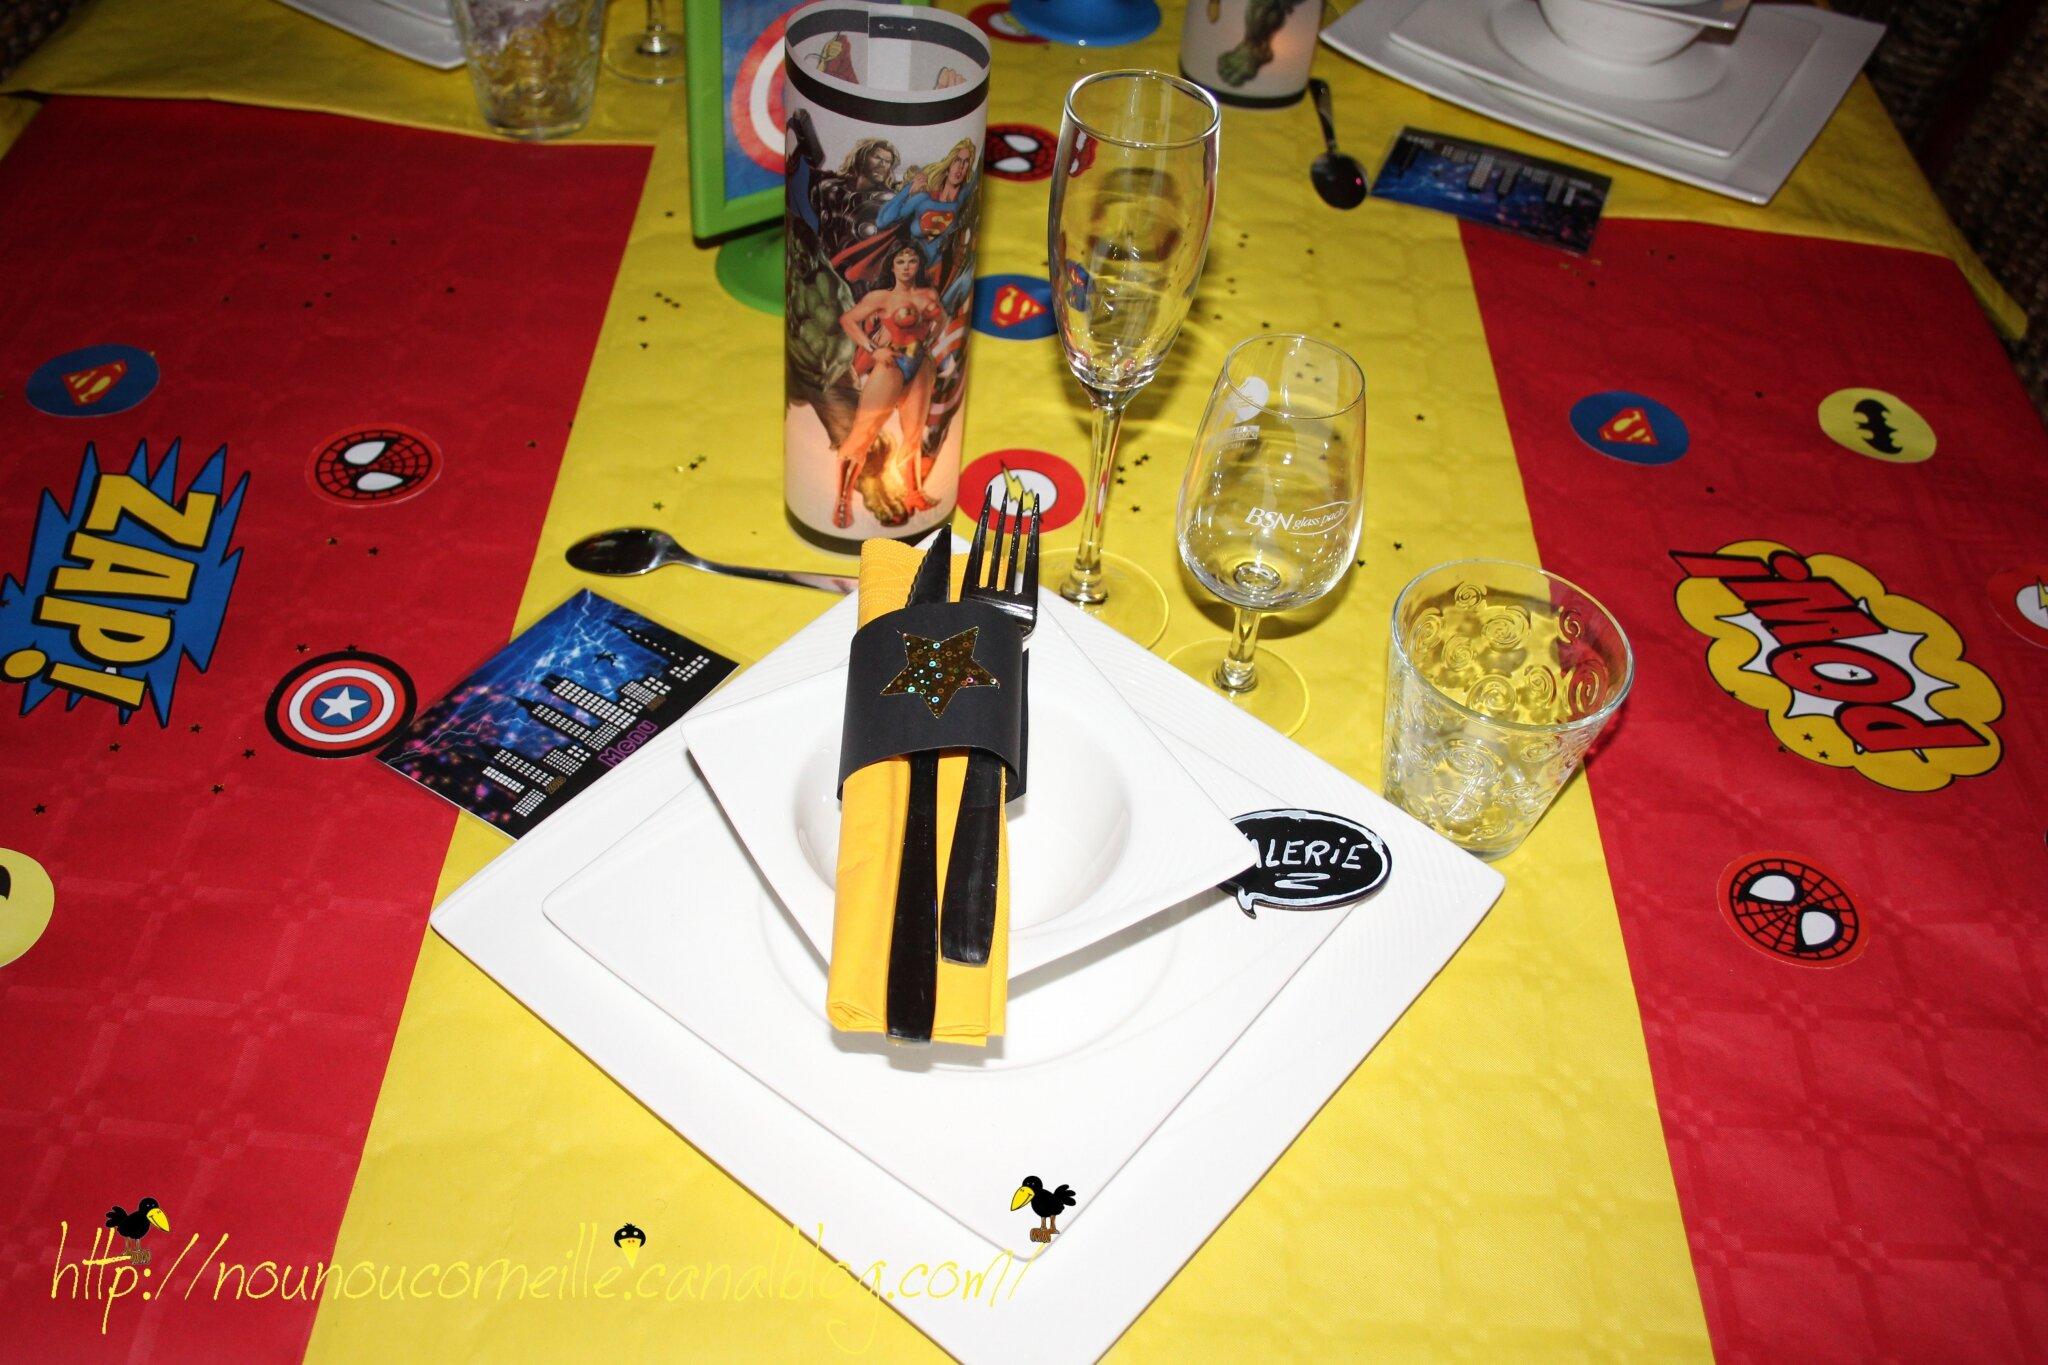 2015 soirée super héros 1